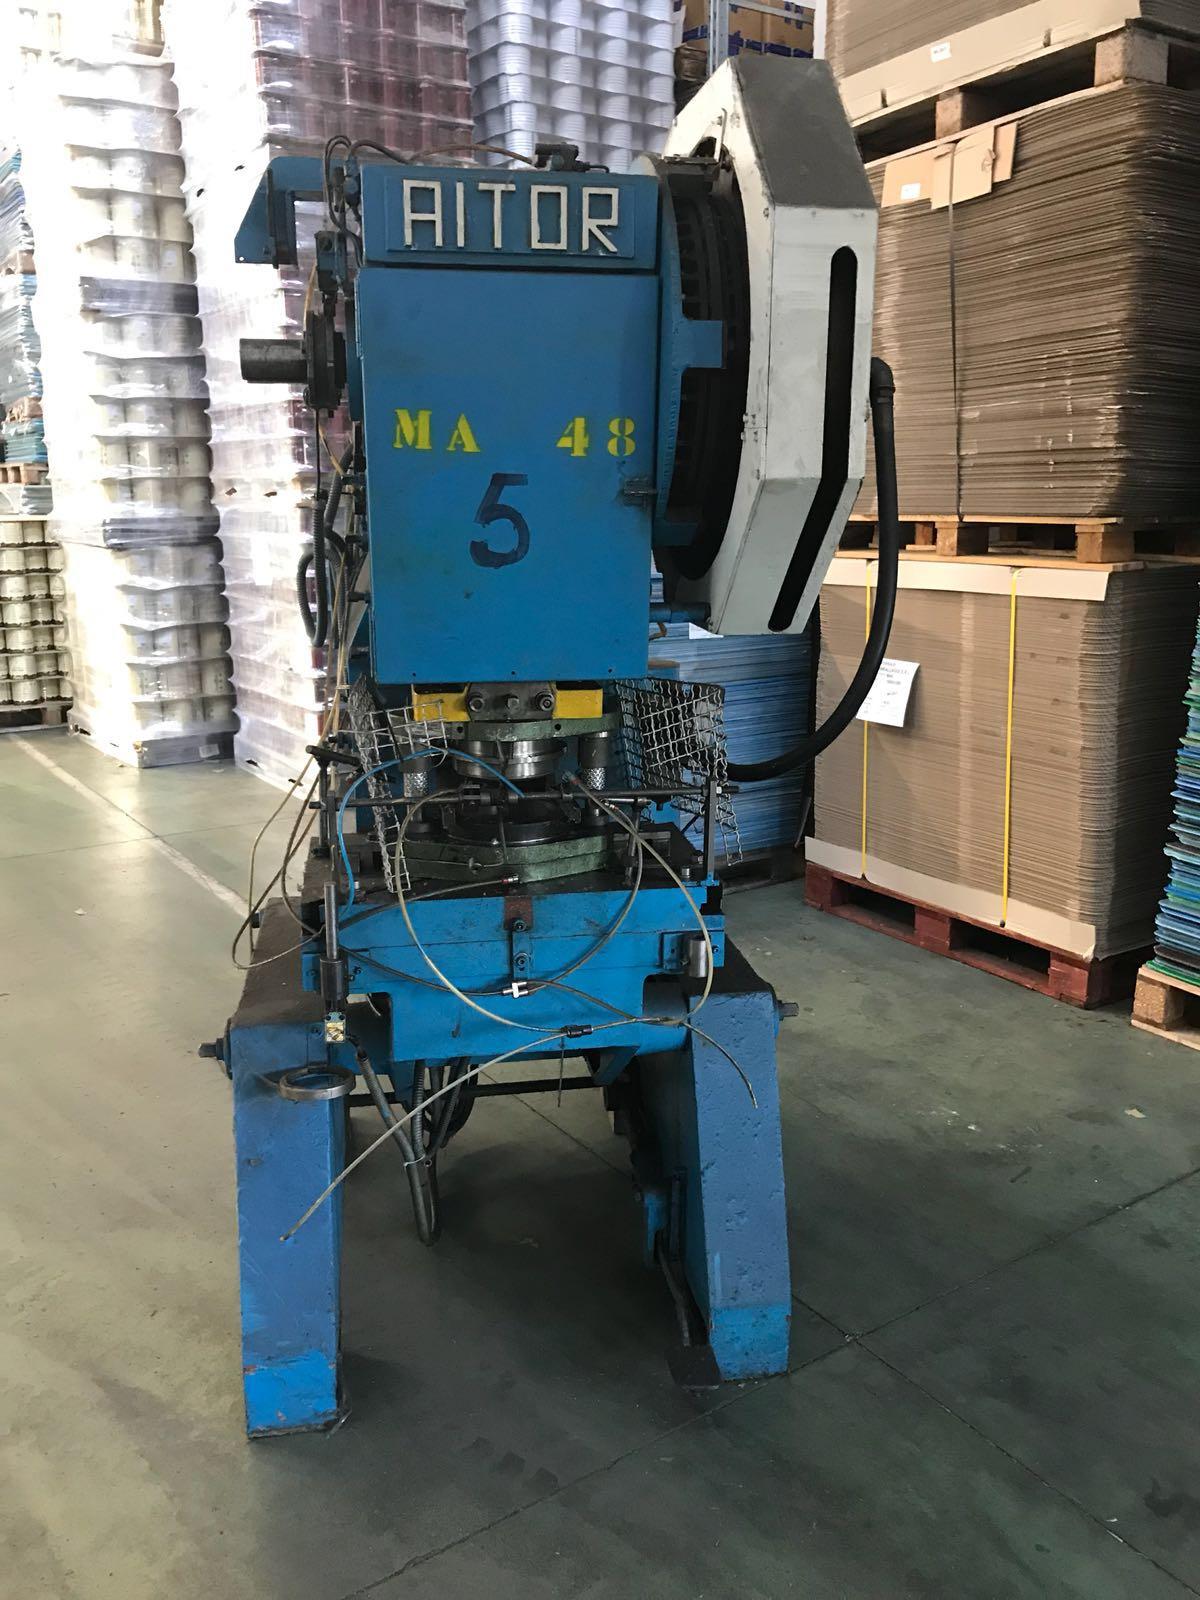 Aitor press